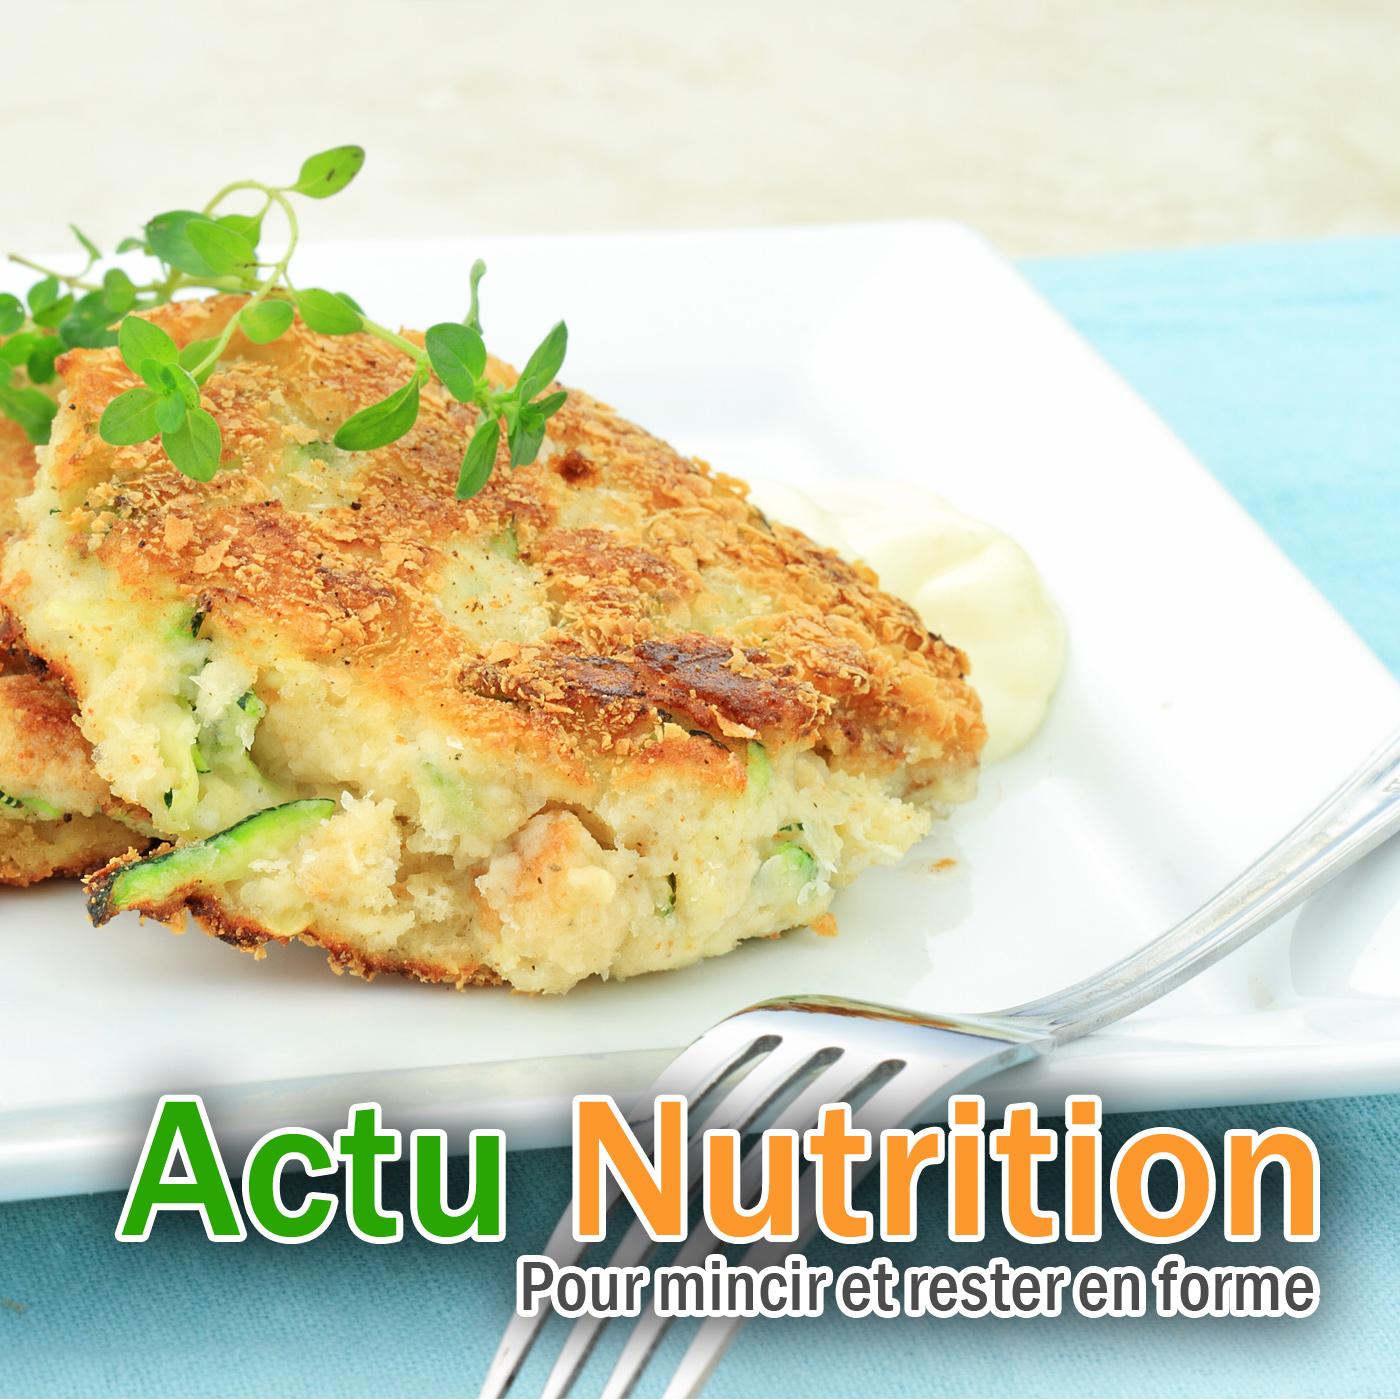 Actu Nutrition